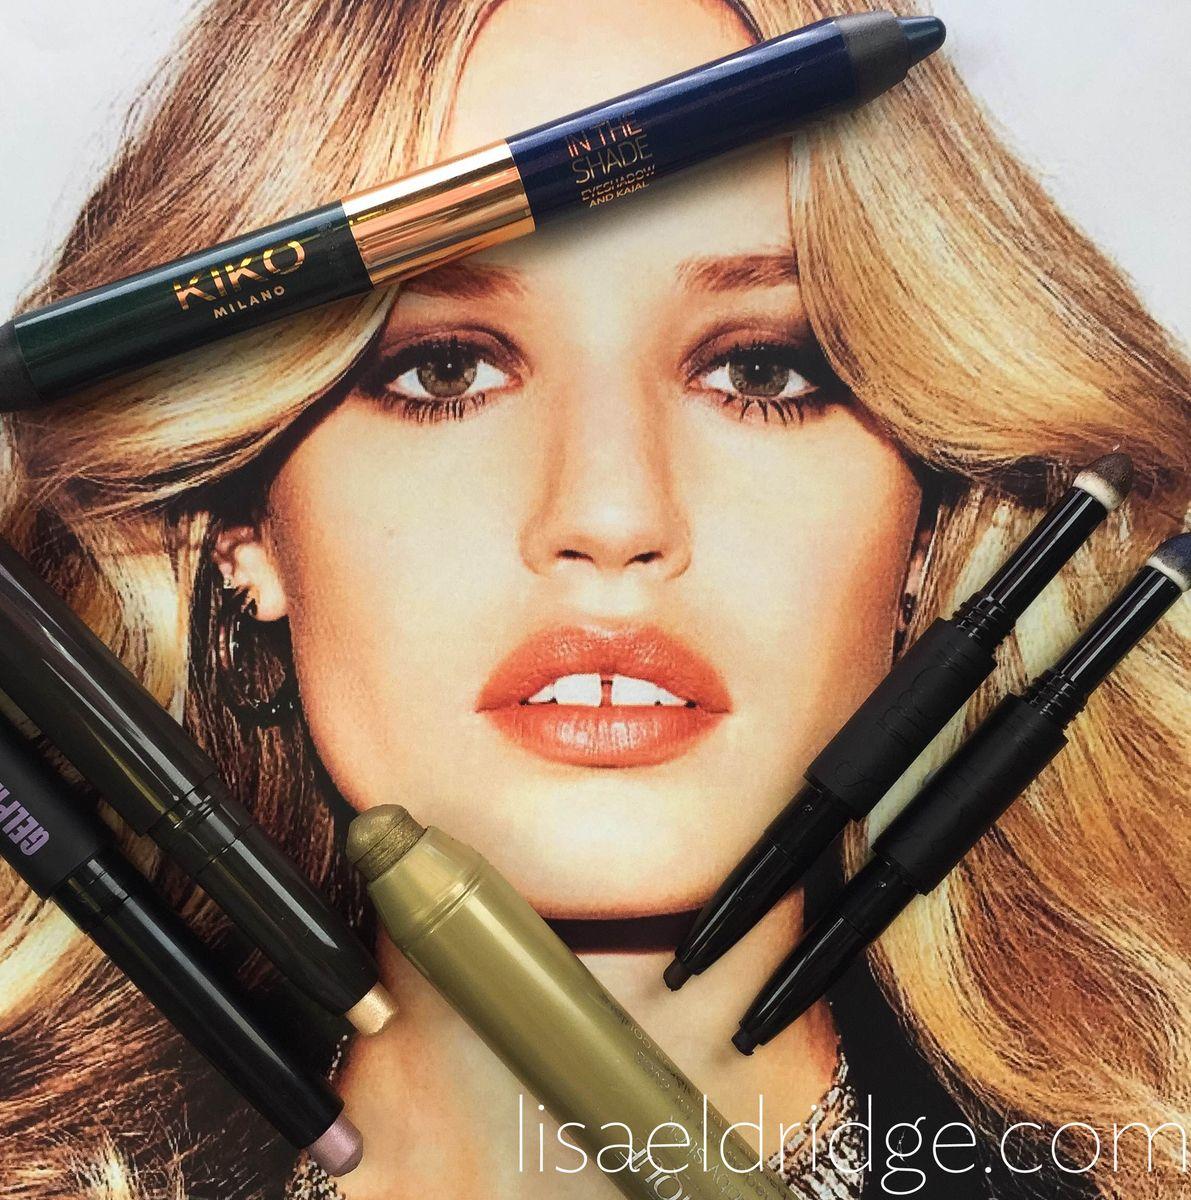 The Skinny On Eyeshadow Sticks Rosy Makeup Lisa Eldridge Makeup Lisa Eldridge